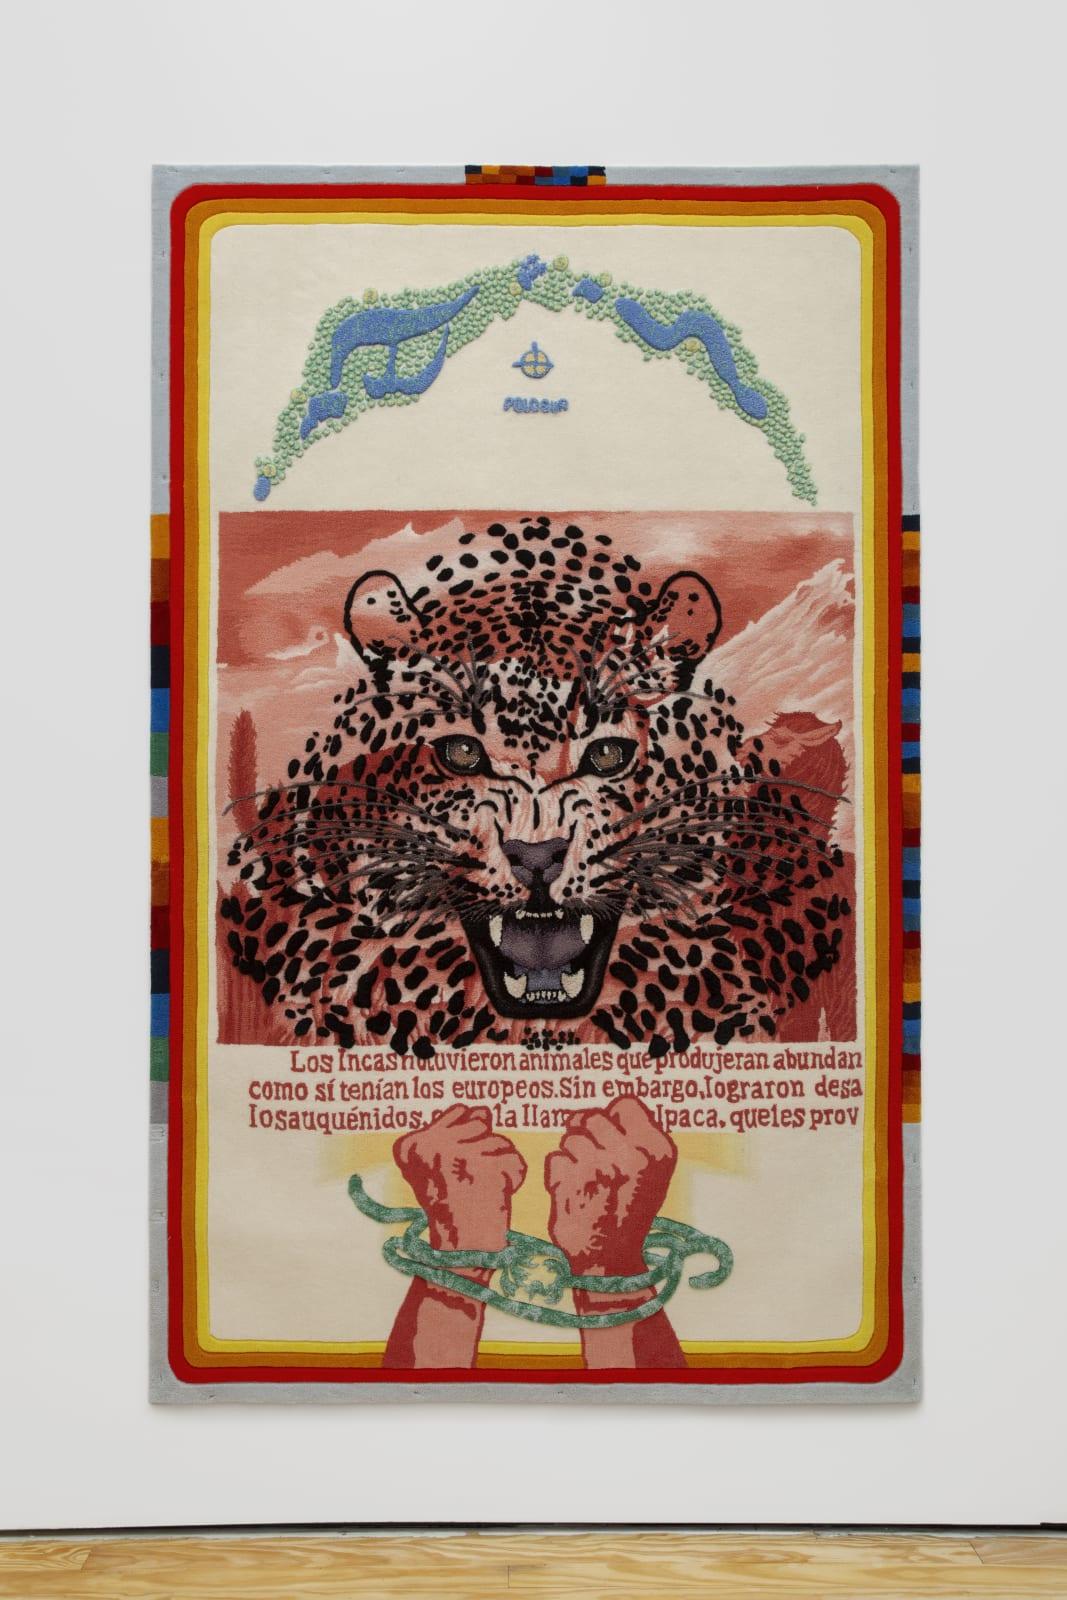 Suqta Pacha, 2020 Tufting 250 x 156 cm | 98 3/8 x 61 3/8 in Edition 2/3 + 1AP $ 10,000.00